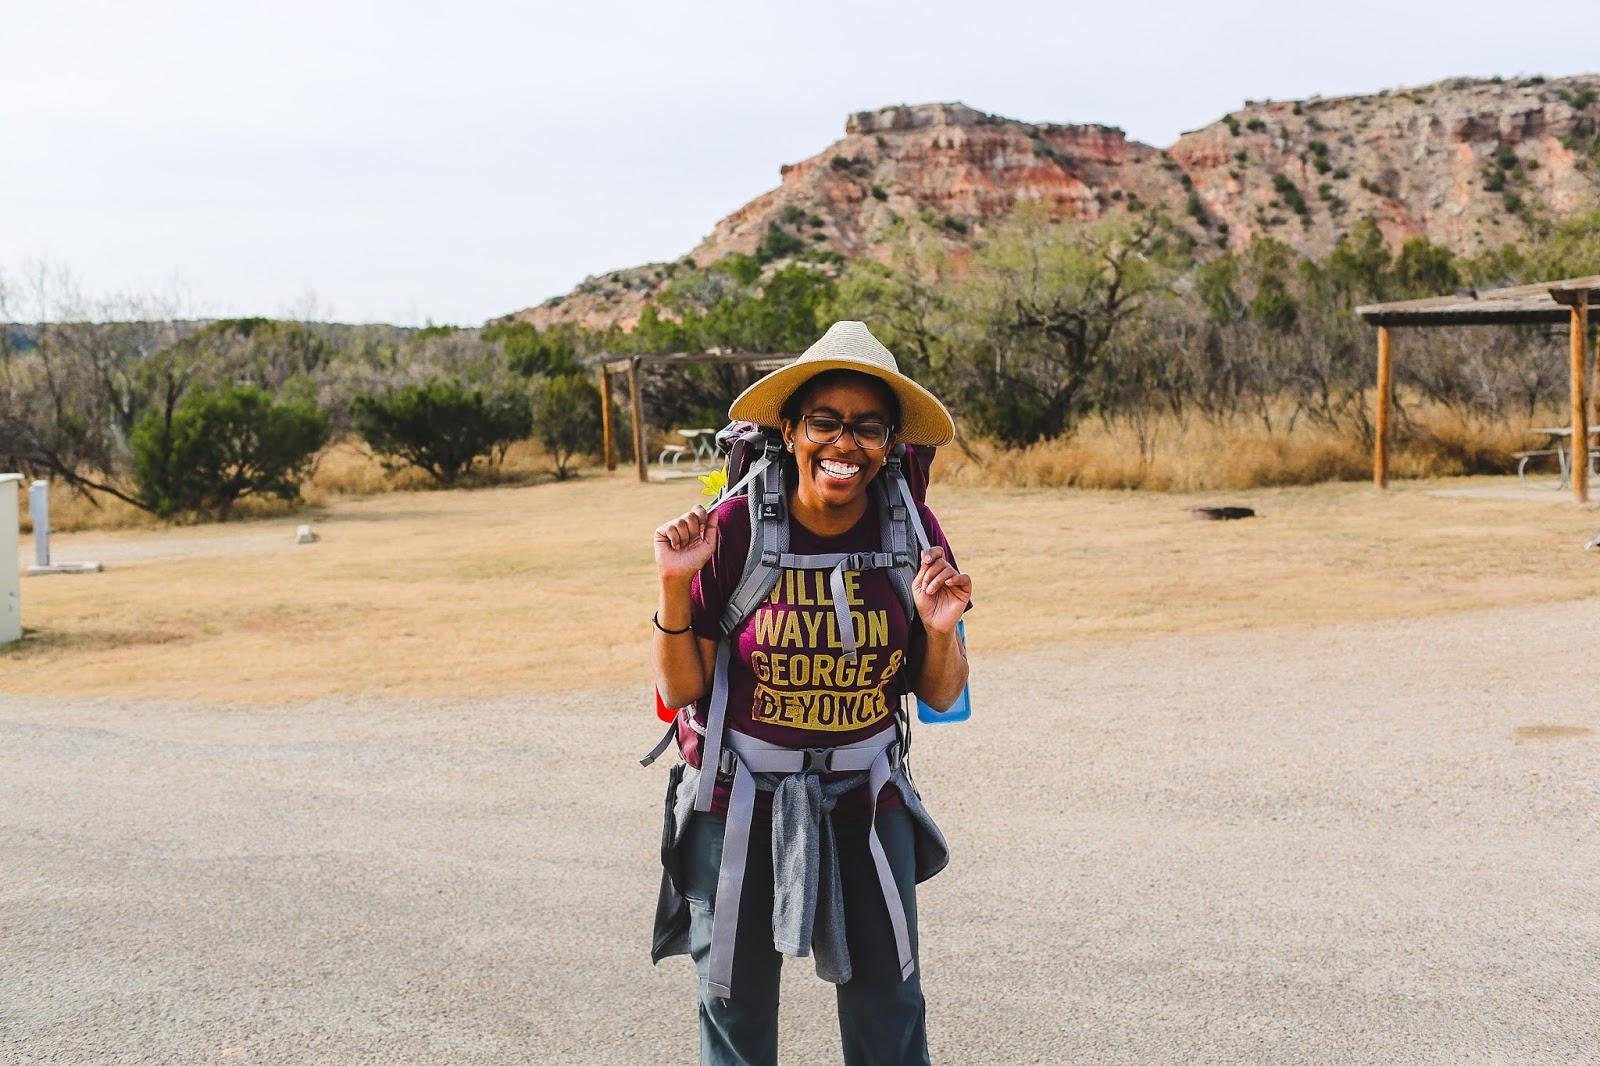 bullzerk Tshirt in Palo Duro Canyon